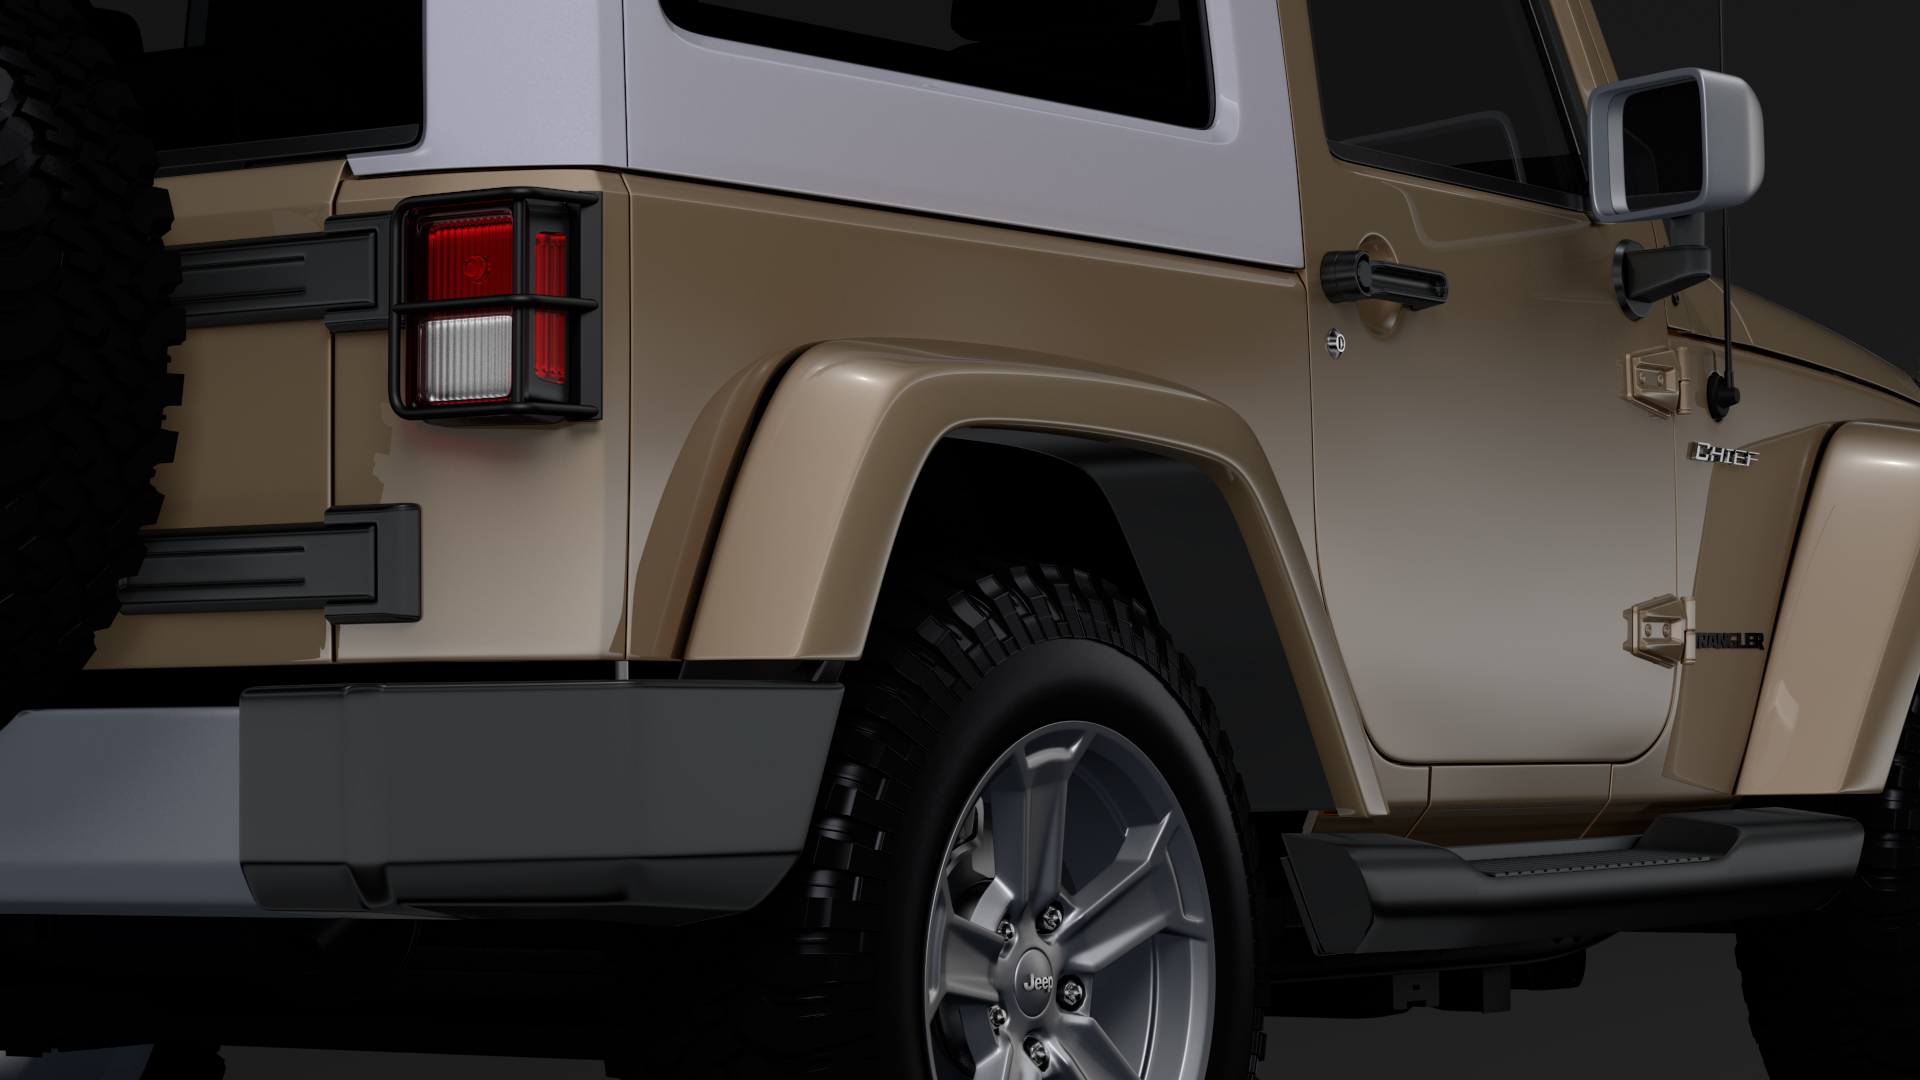 jeep wrangler chief jk 2017 3d model max fbx c4d lwo ma mb hrc xsi obj 276881